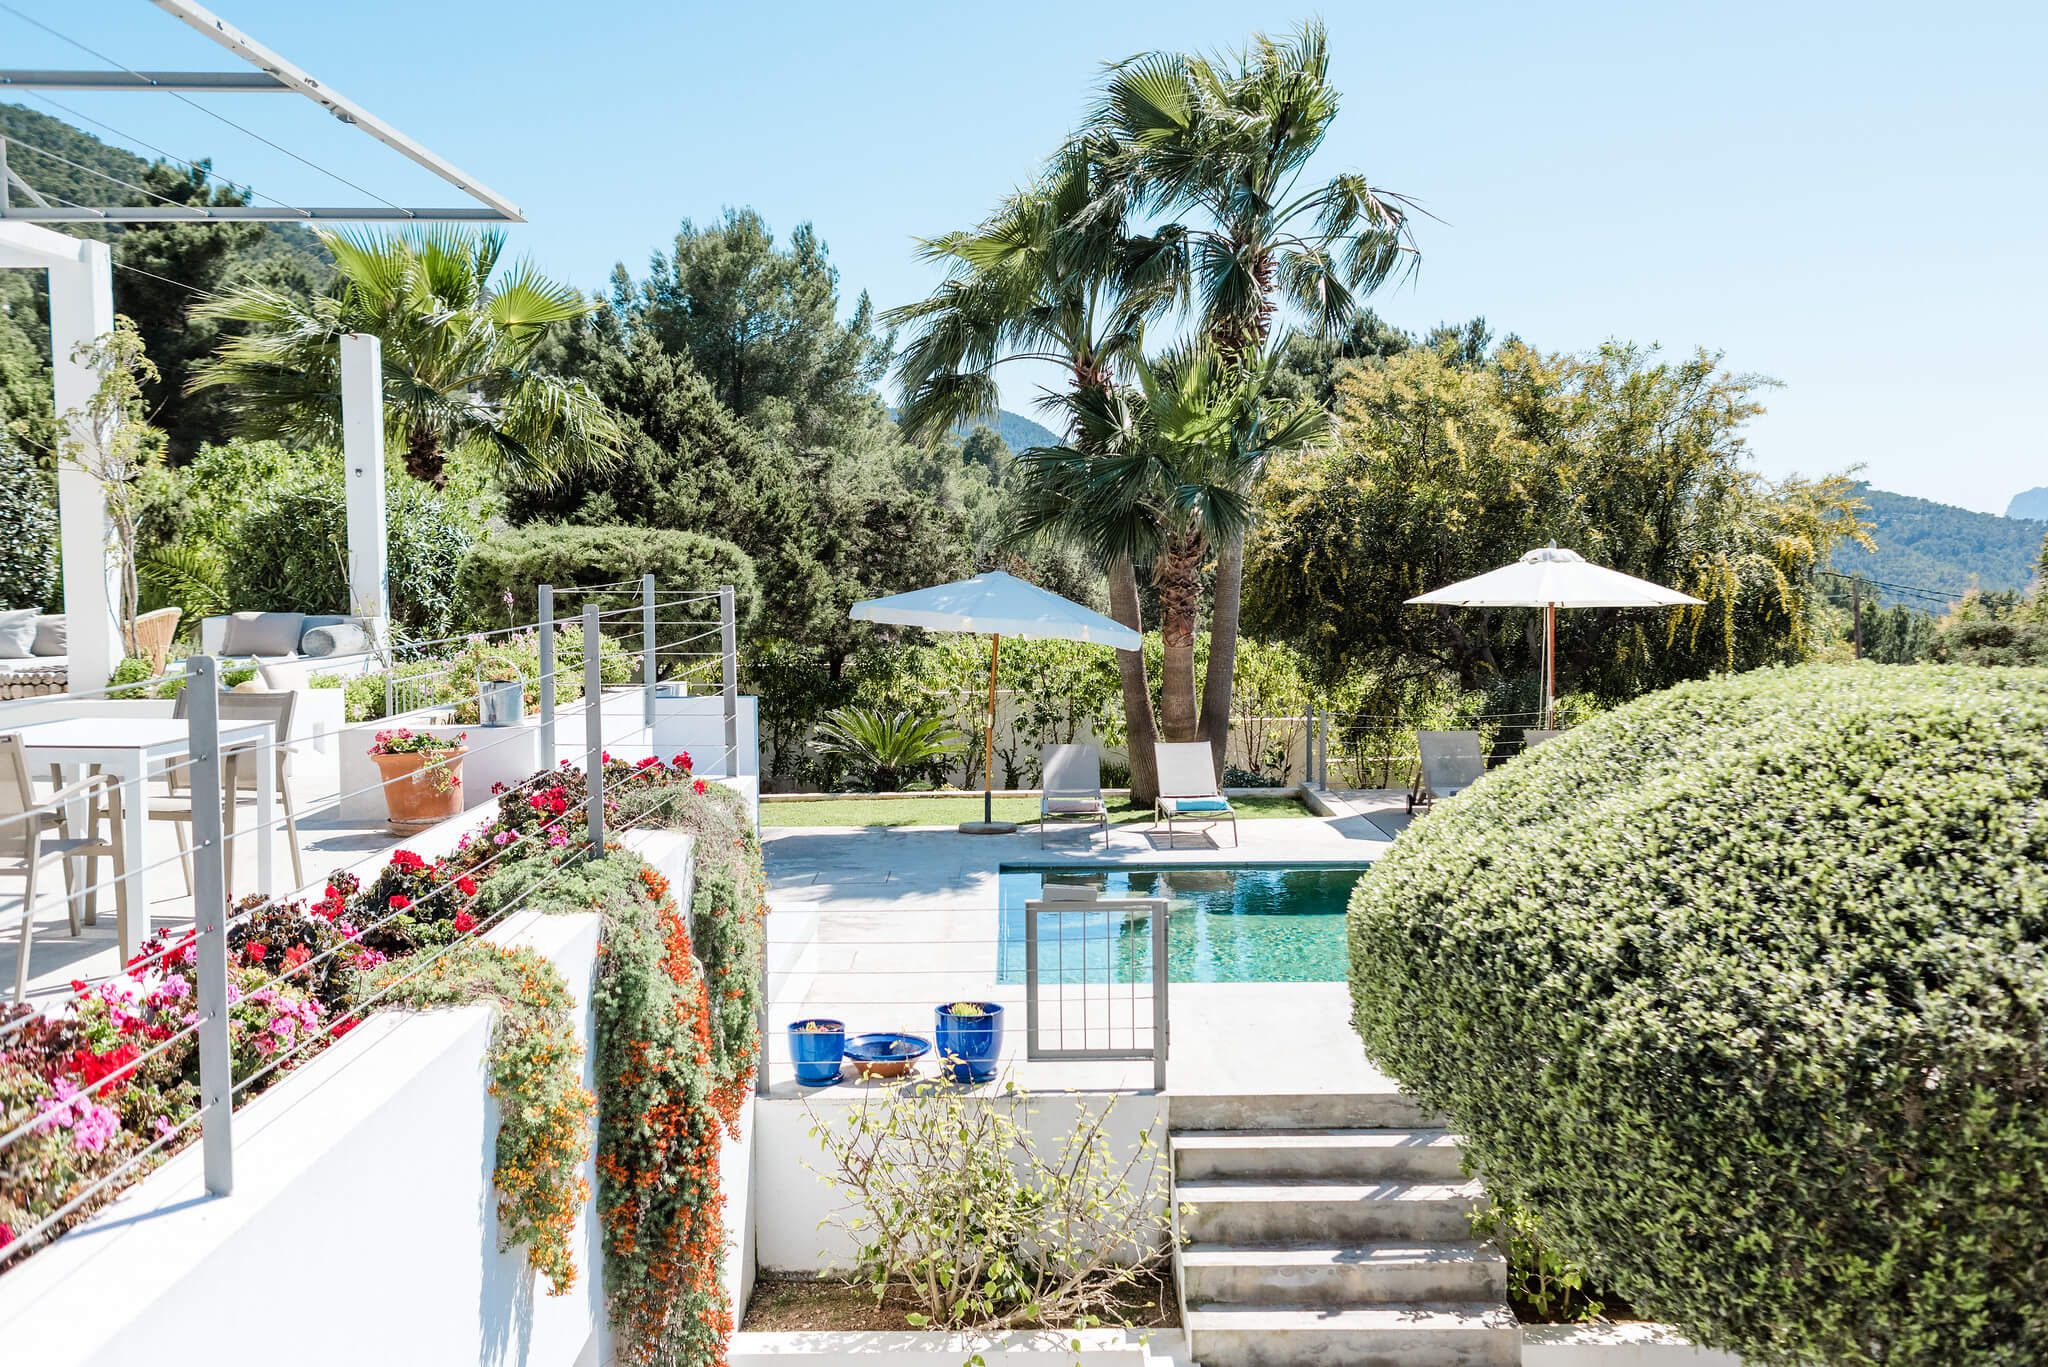 https://www.white-ibiza.com/wp-content/uploads/2020/06/white-ibiza-villas-casa-nyah-exterior-steps-to-pool.jpg